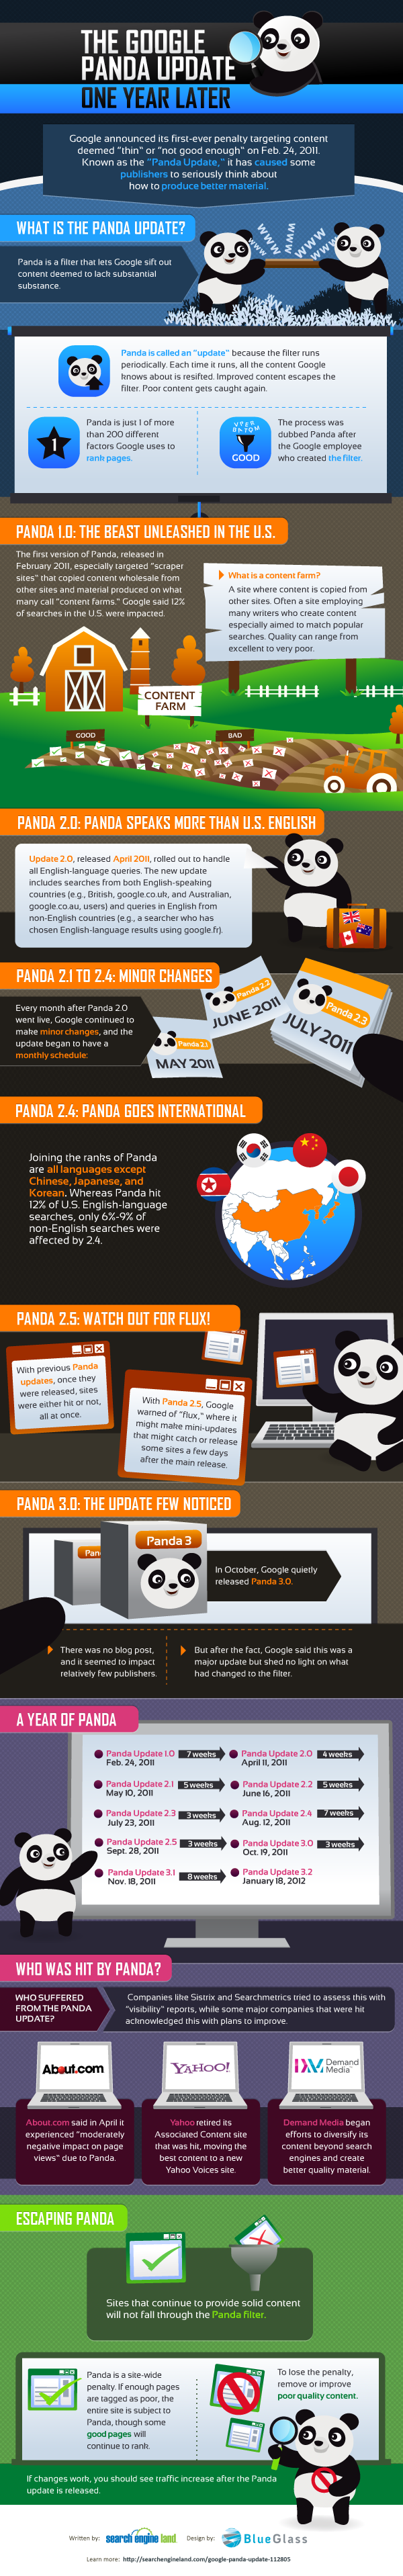 The Google Panda Update, One Year Later